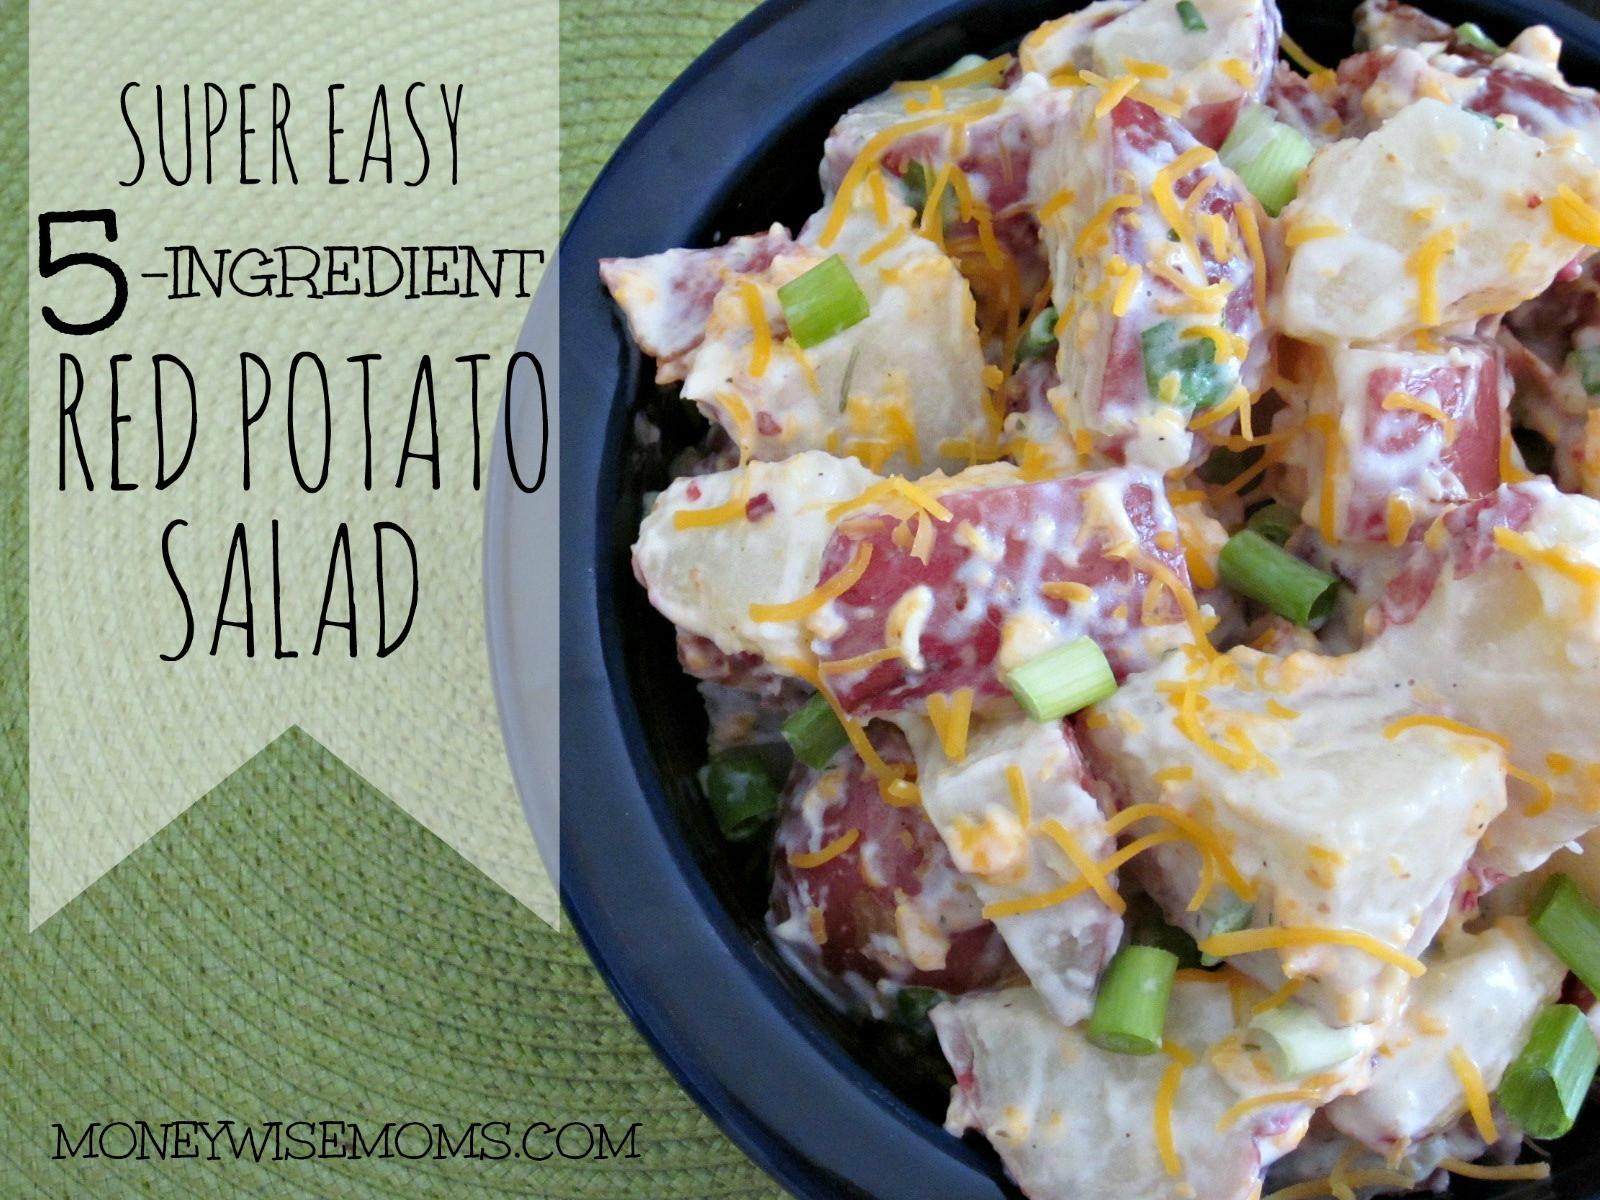 Red Potato Salad Recipes  Super Easy 5 Ingre nt Red Potato Salad Moneywise Moms